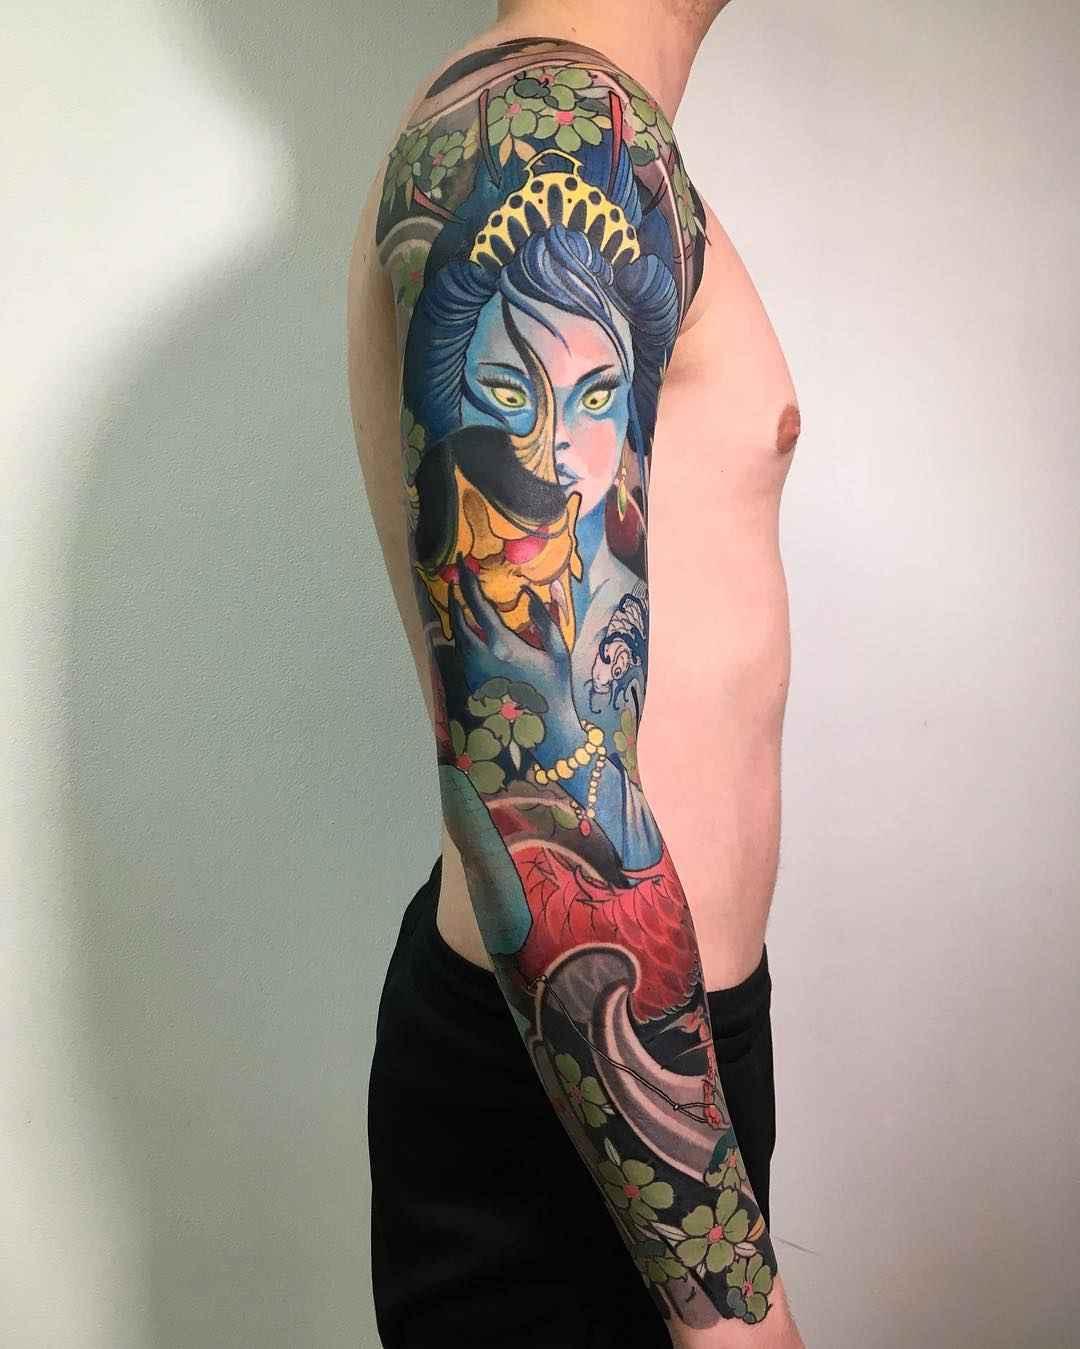 Japanese tattoos by Slava Fil Filitov